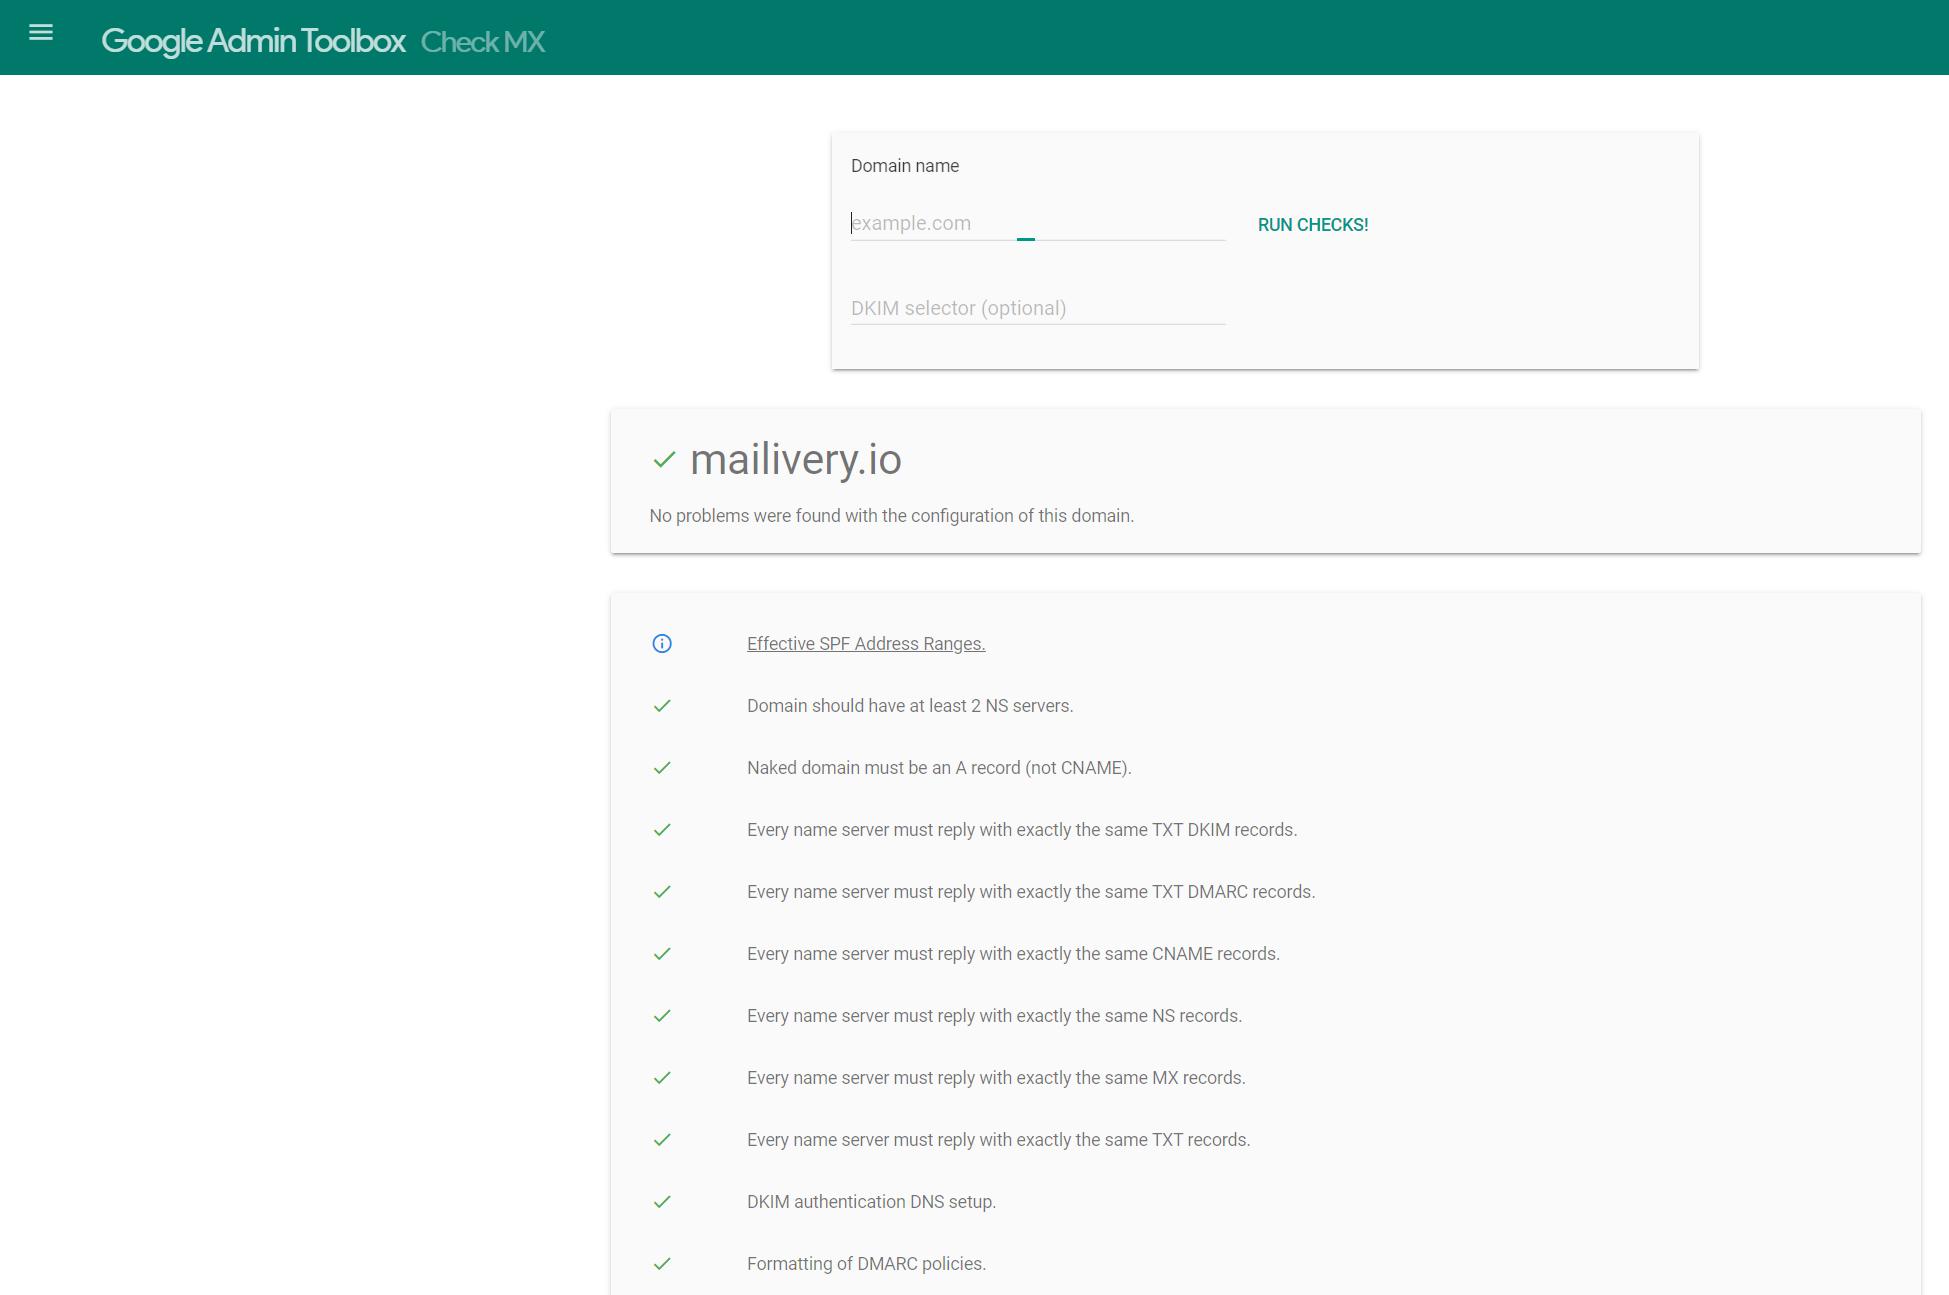 google admin toolbox check mx